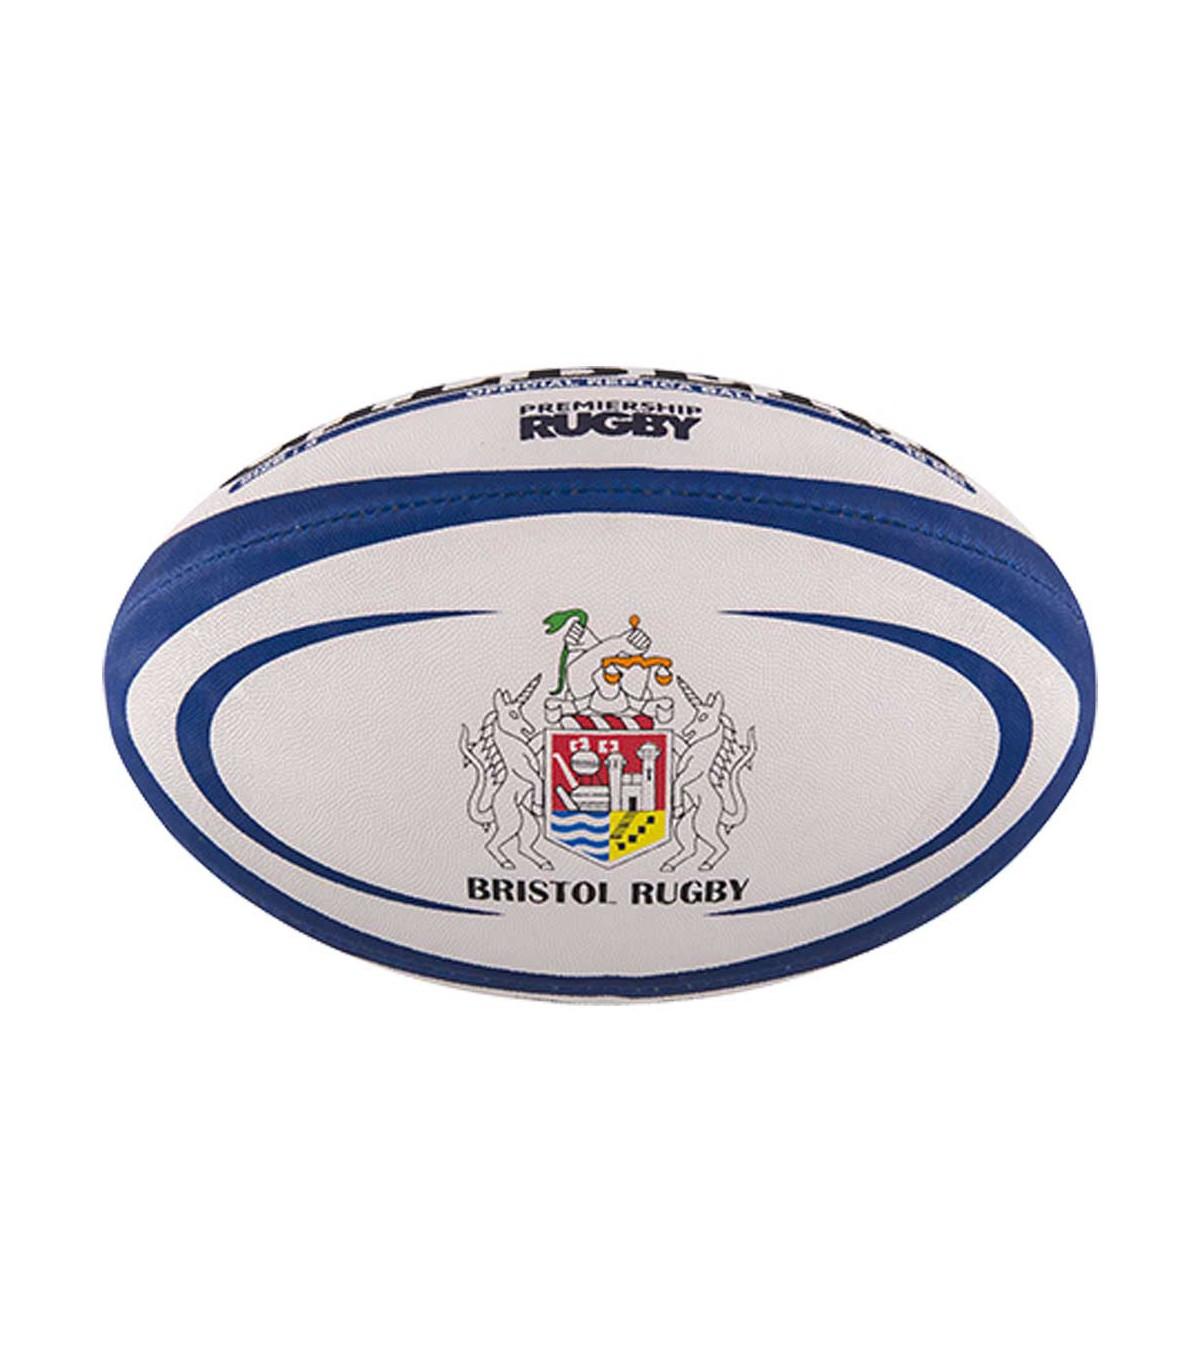 Ballon rugby Bristol - Réplica T5 - Gilbert chez Rugby